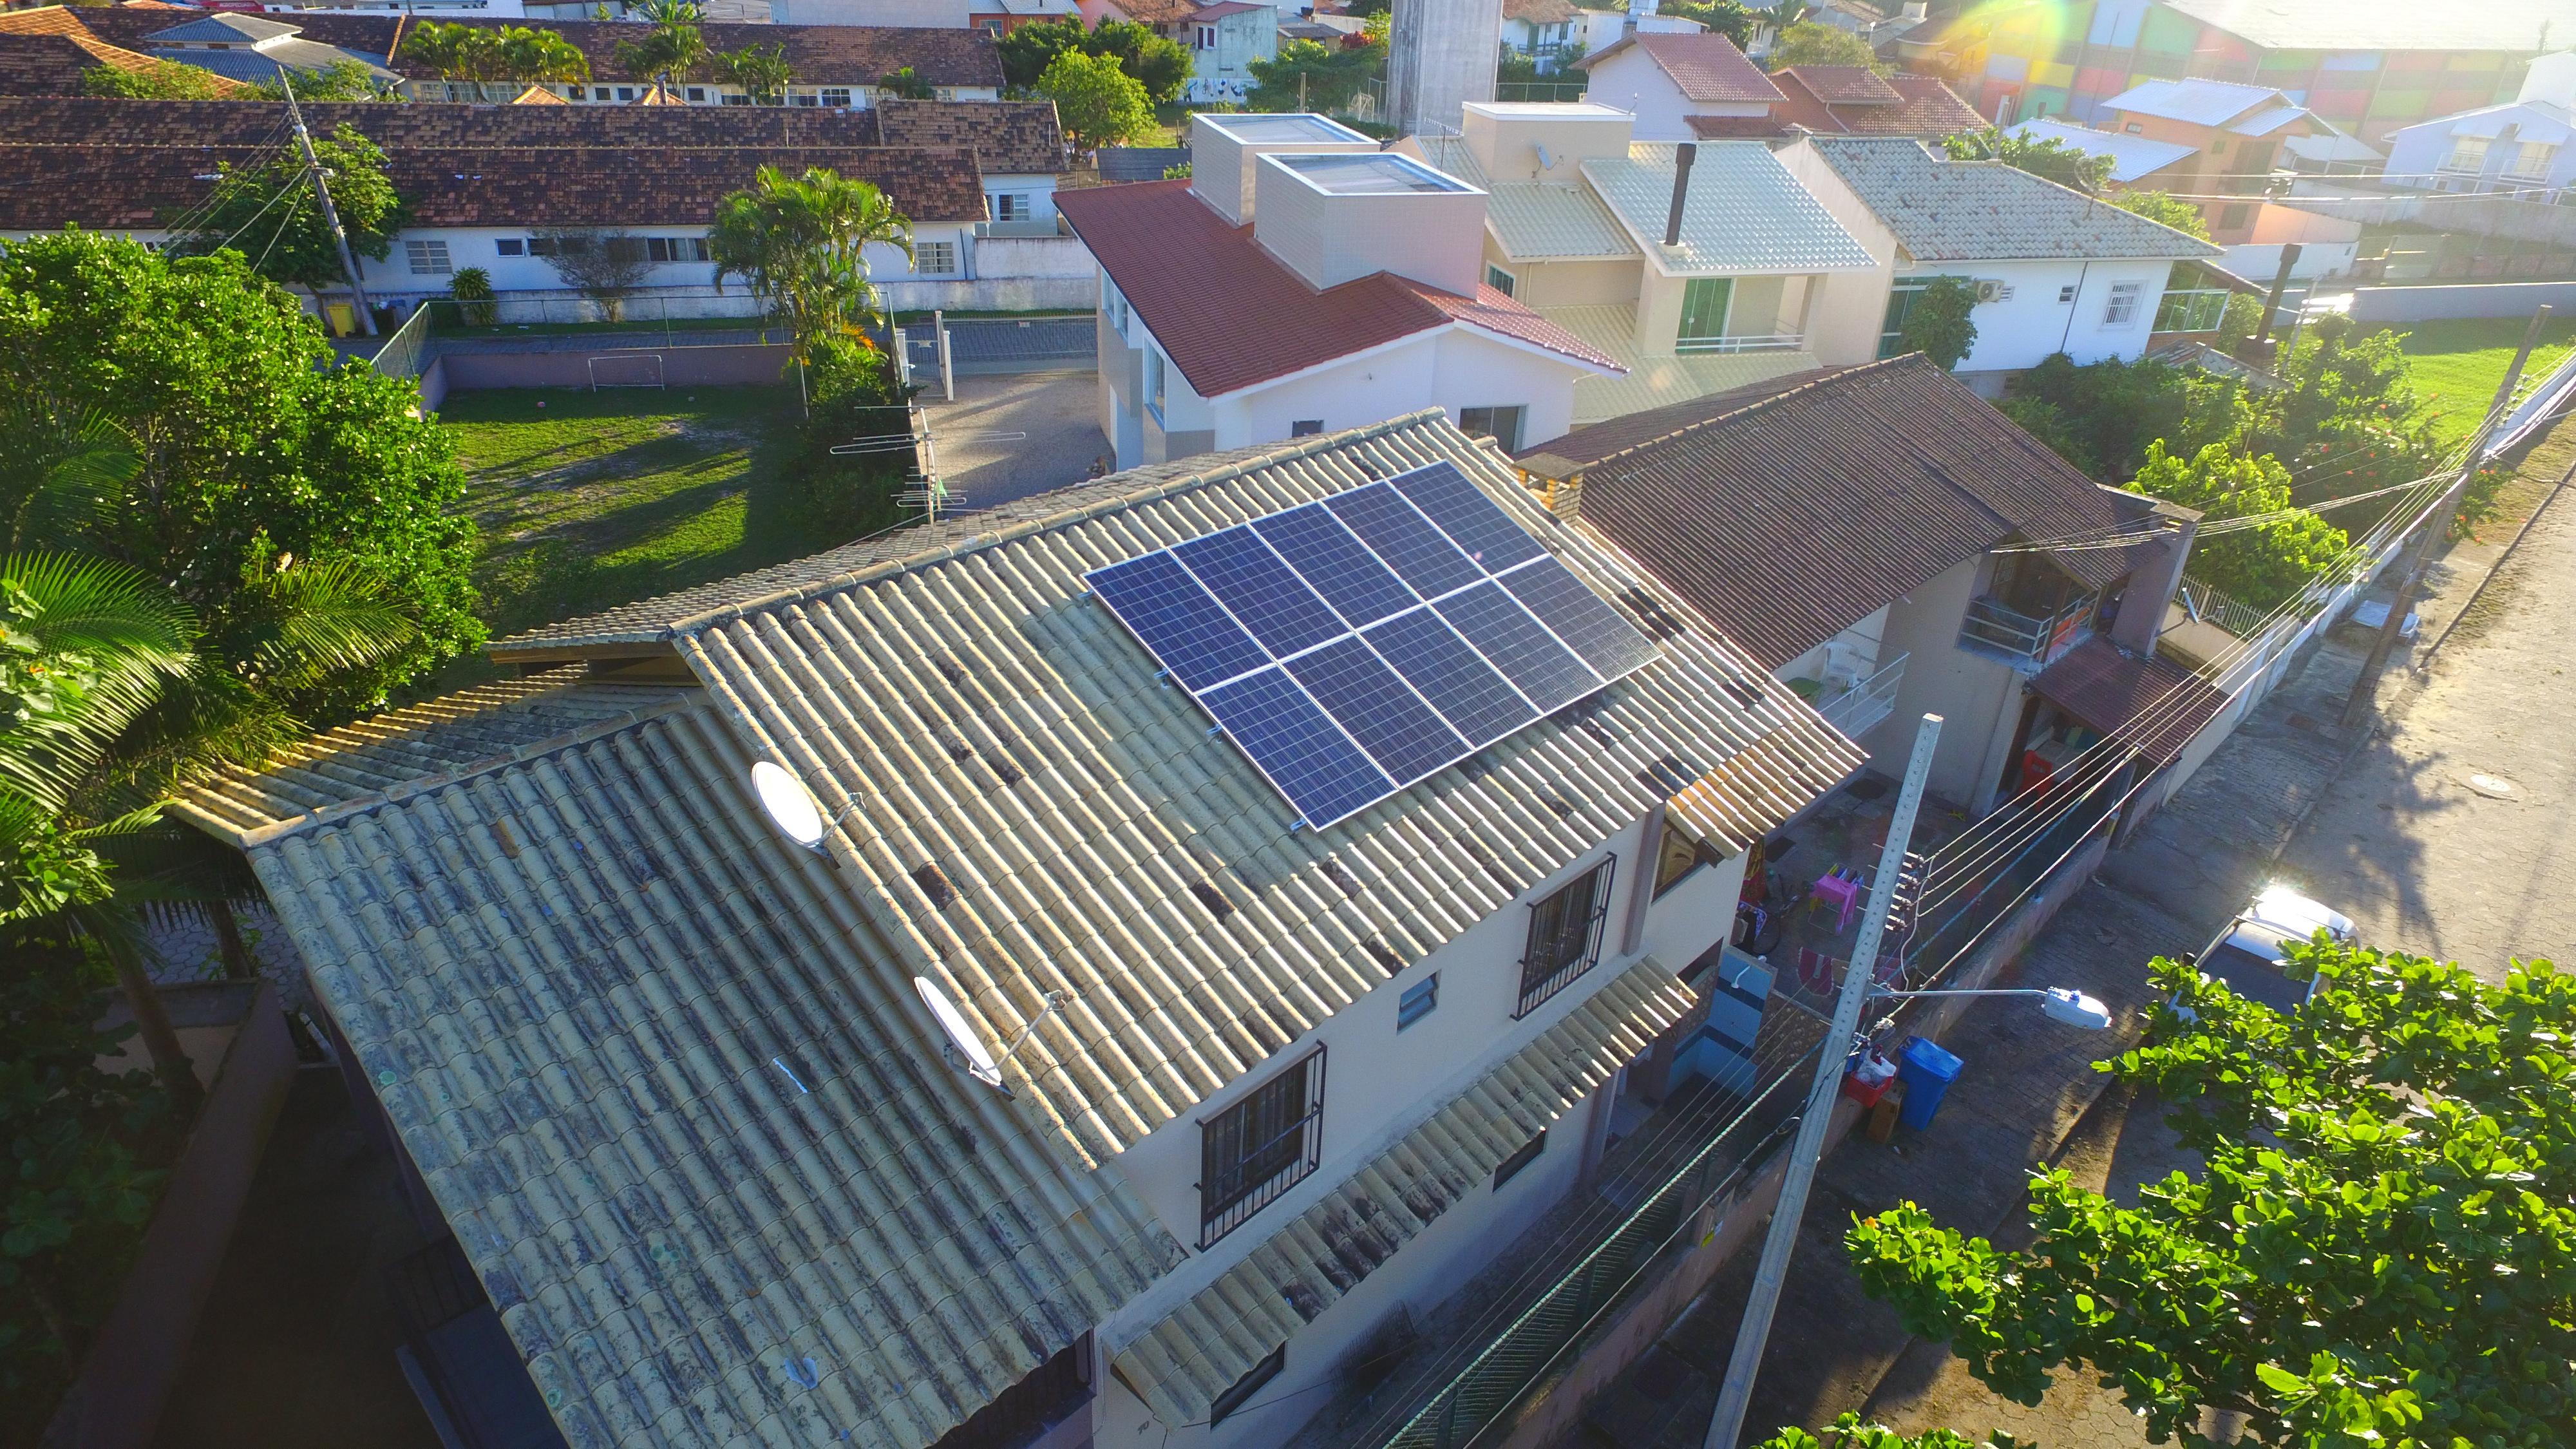 Projeto instala 200 sistemas de energia solar em Santa Catarina